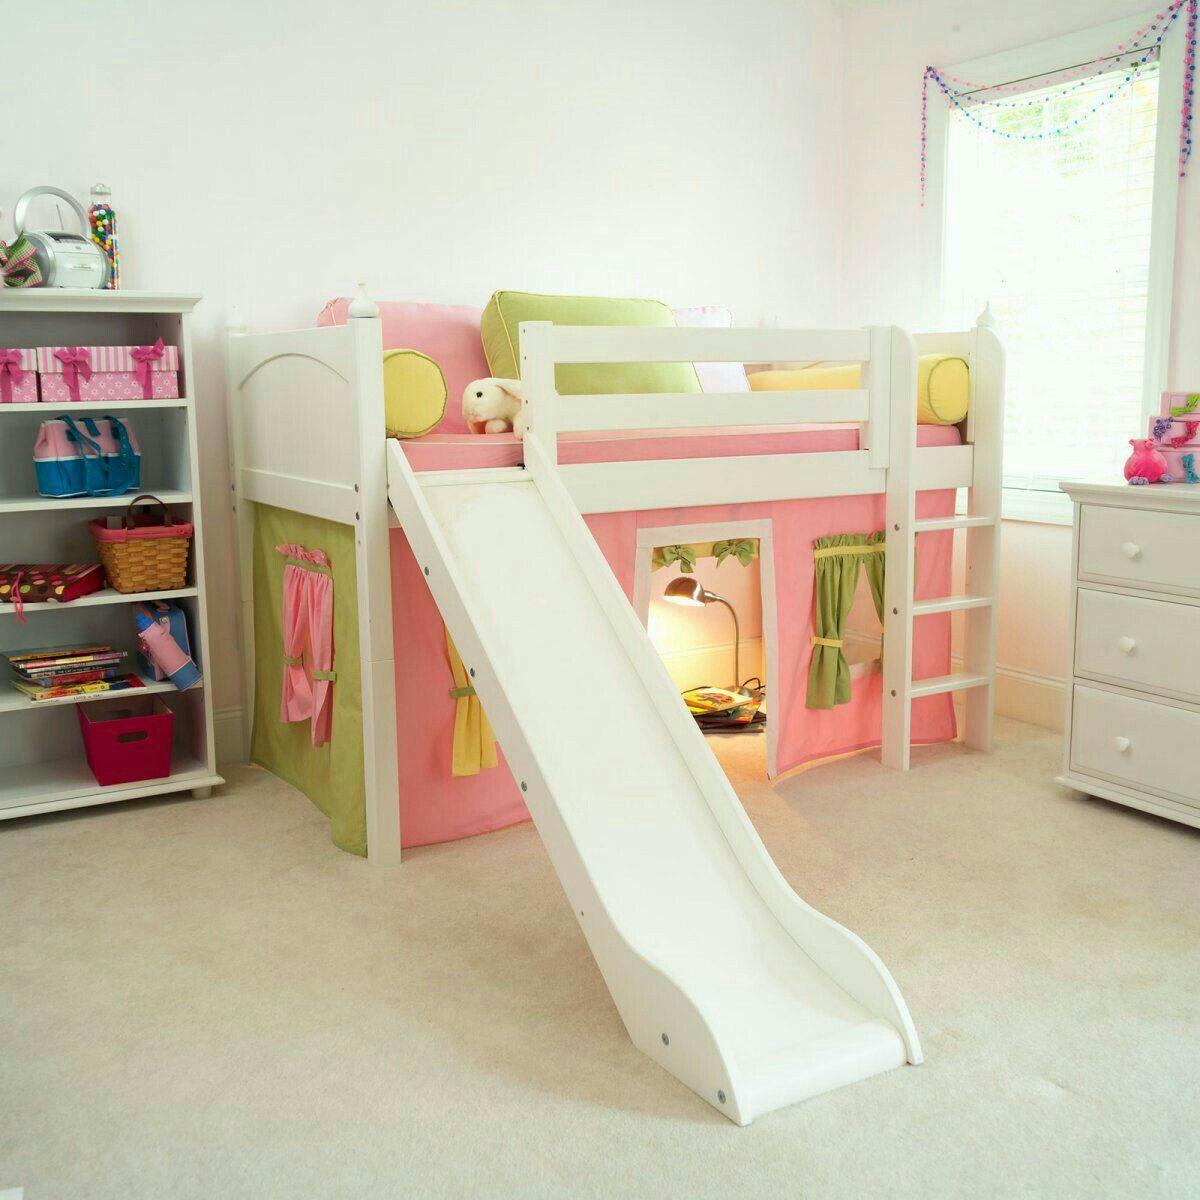 Cute loft bed ideas  Pin by Priscila Santos on Quarto casa  Pinterest